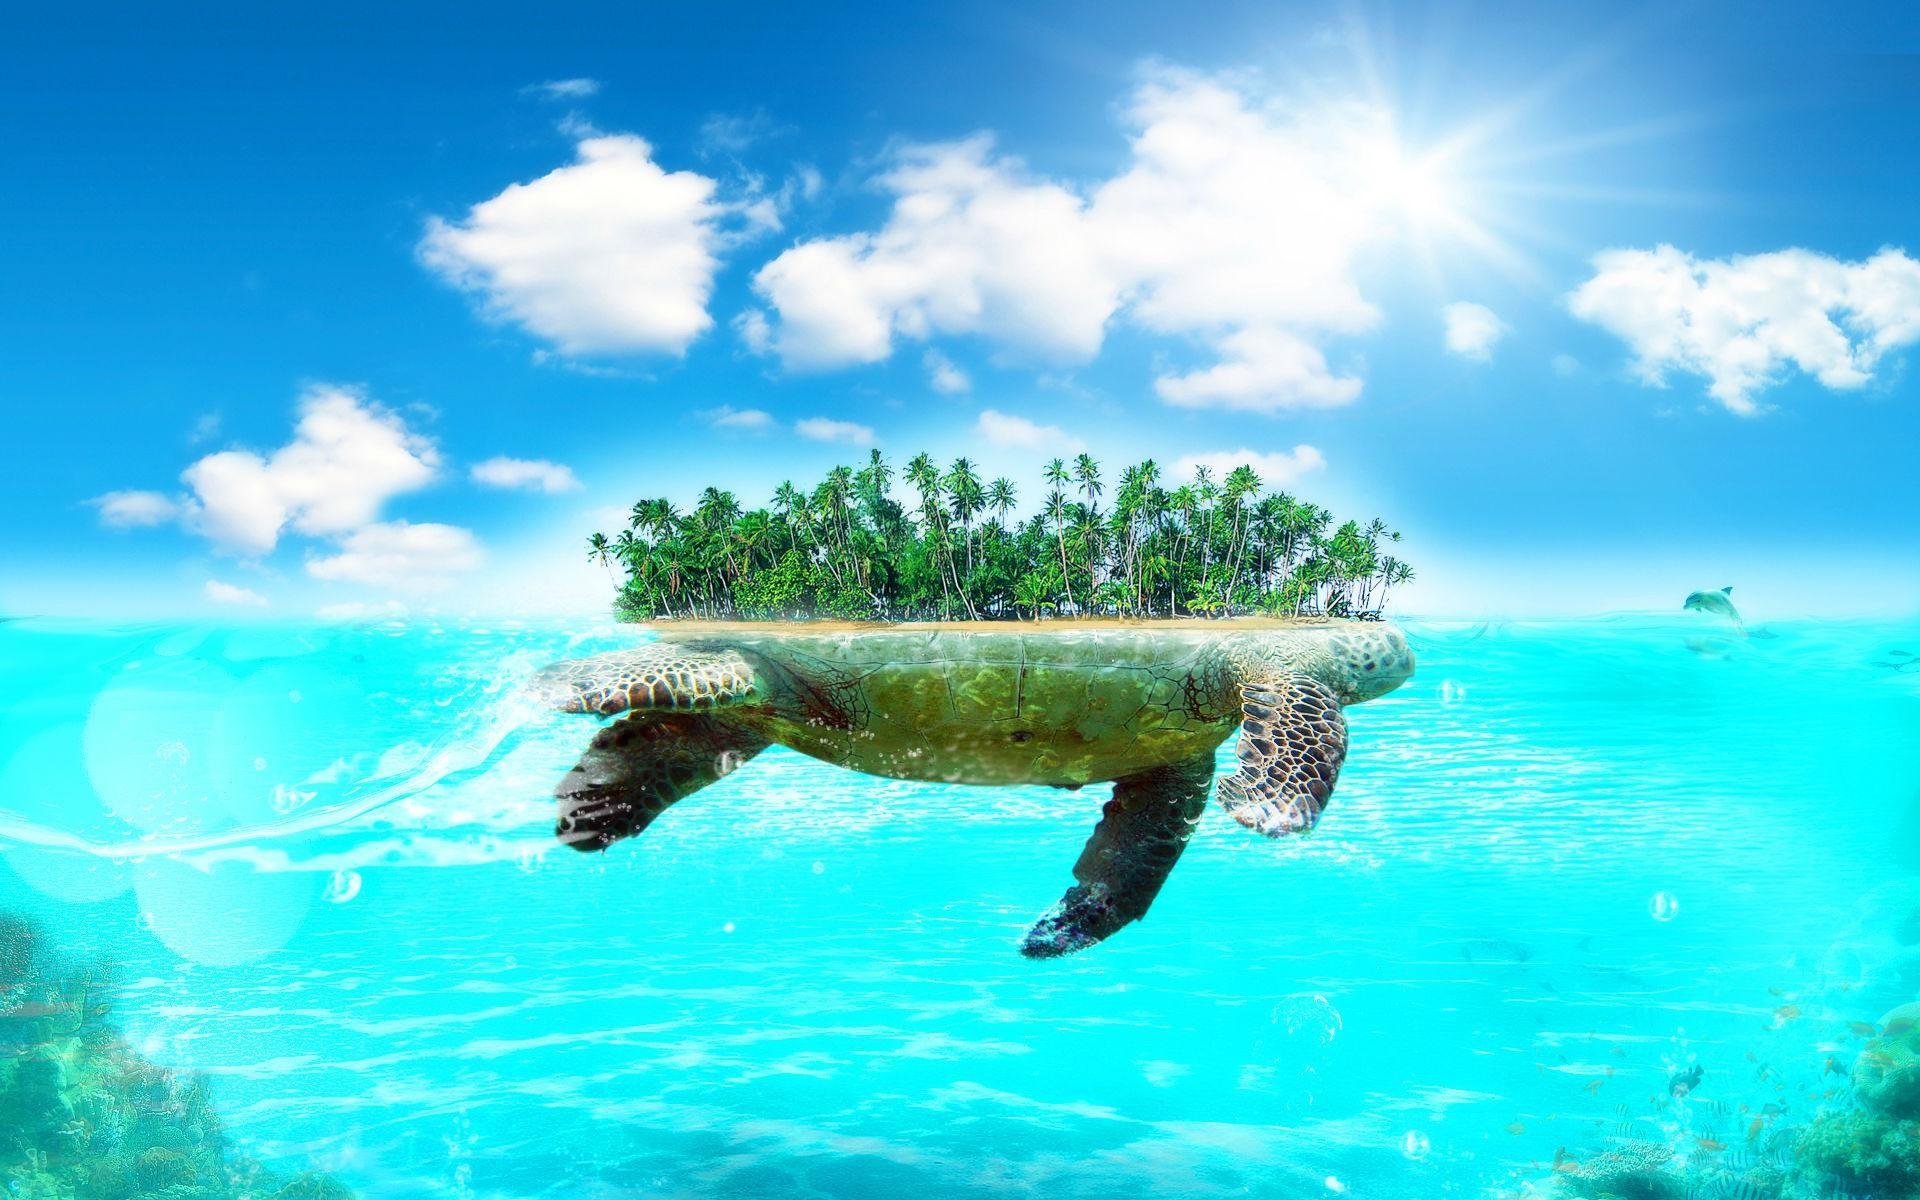 hd-wallpapers-turtle-island-beautiful-large-wallpaper-desktop-